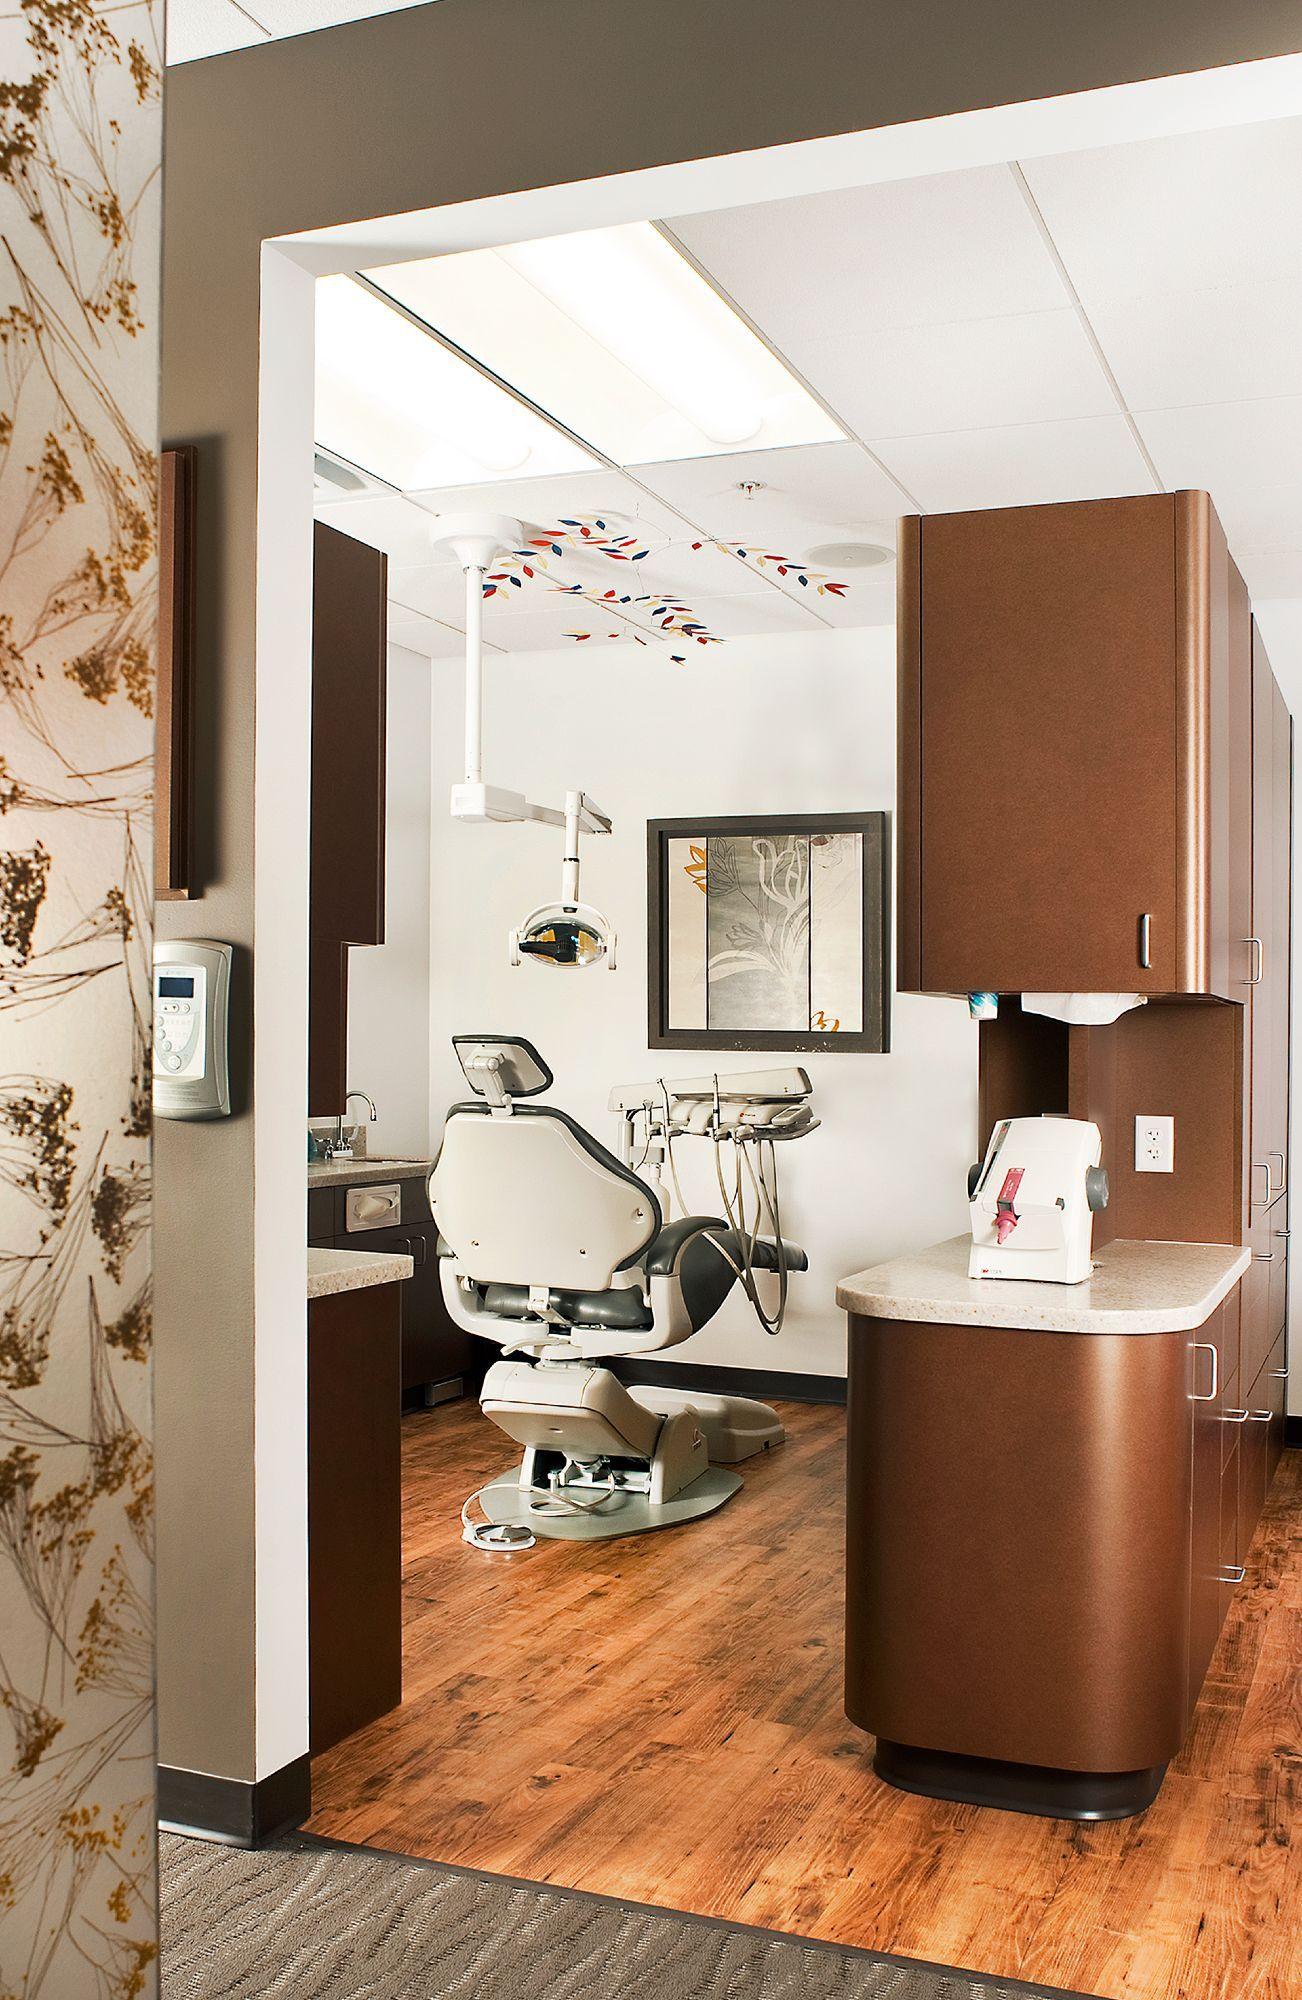 dental office designs photos. Dental Office Design - Elements Family Dentistry JoeArchitect Designs Photos D